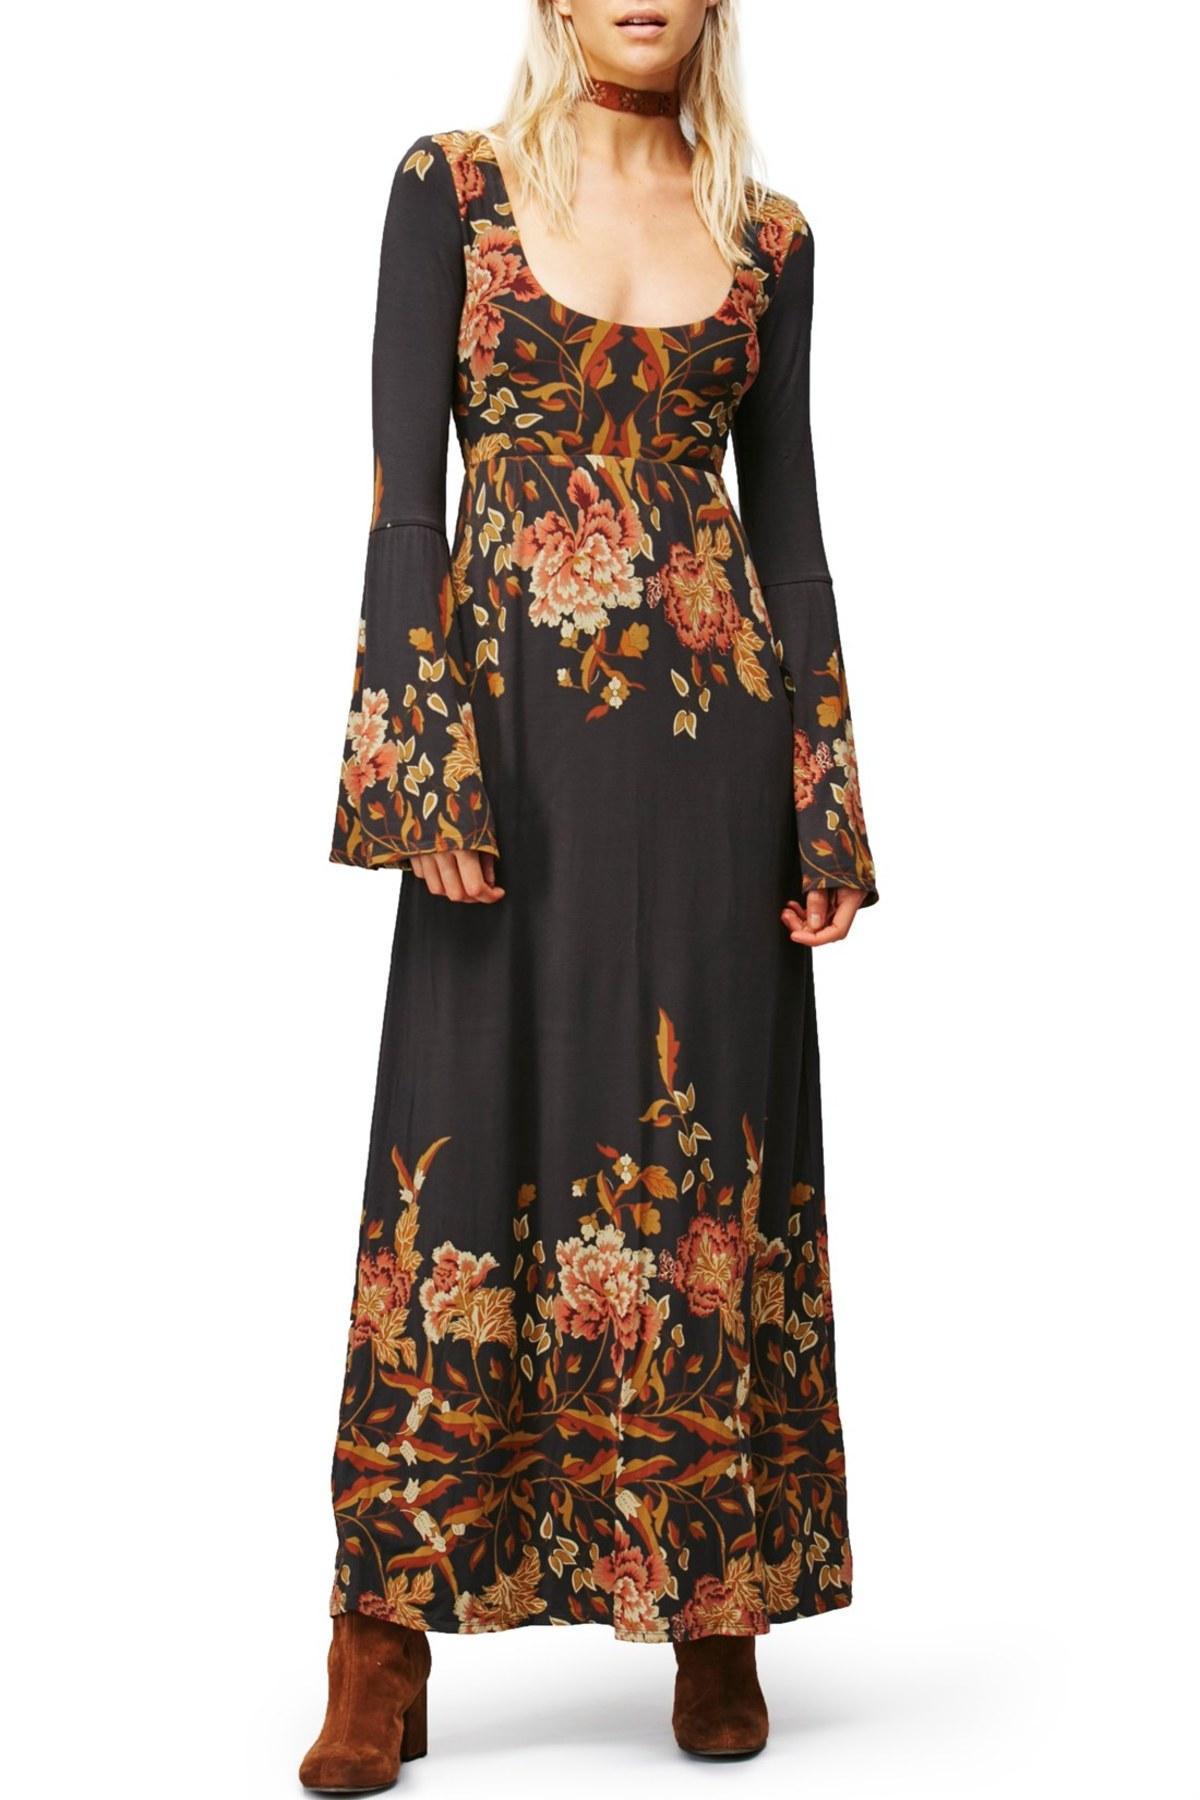 Lyst Free People Midnight Garden Maxi Dress